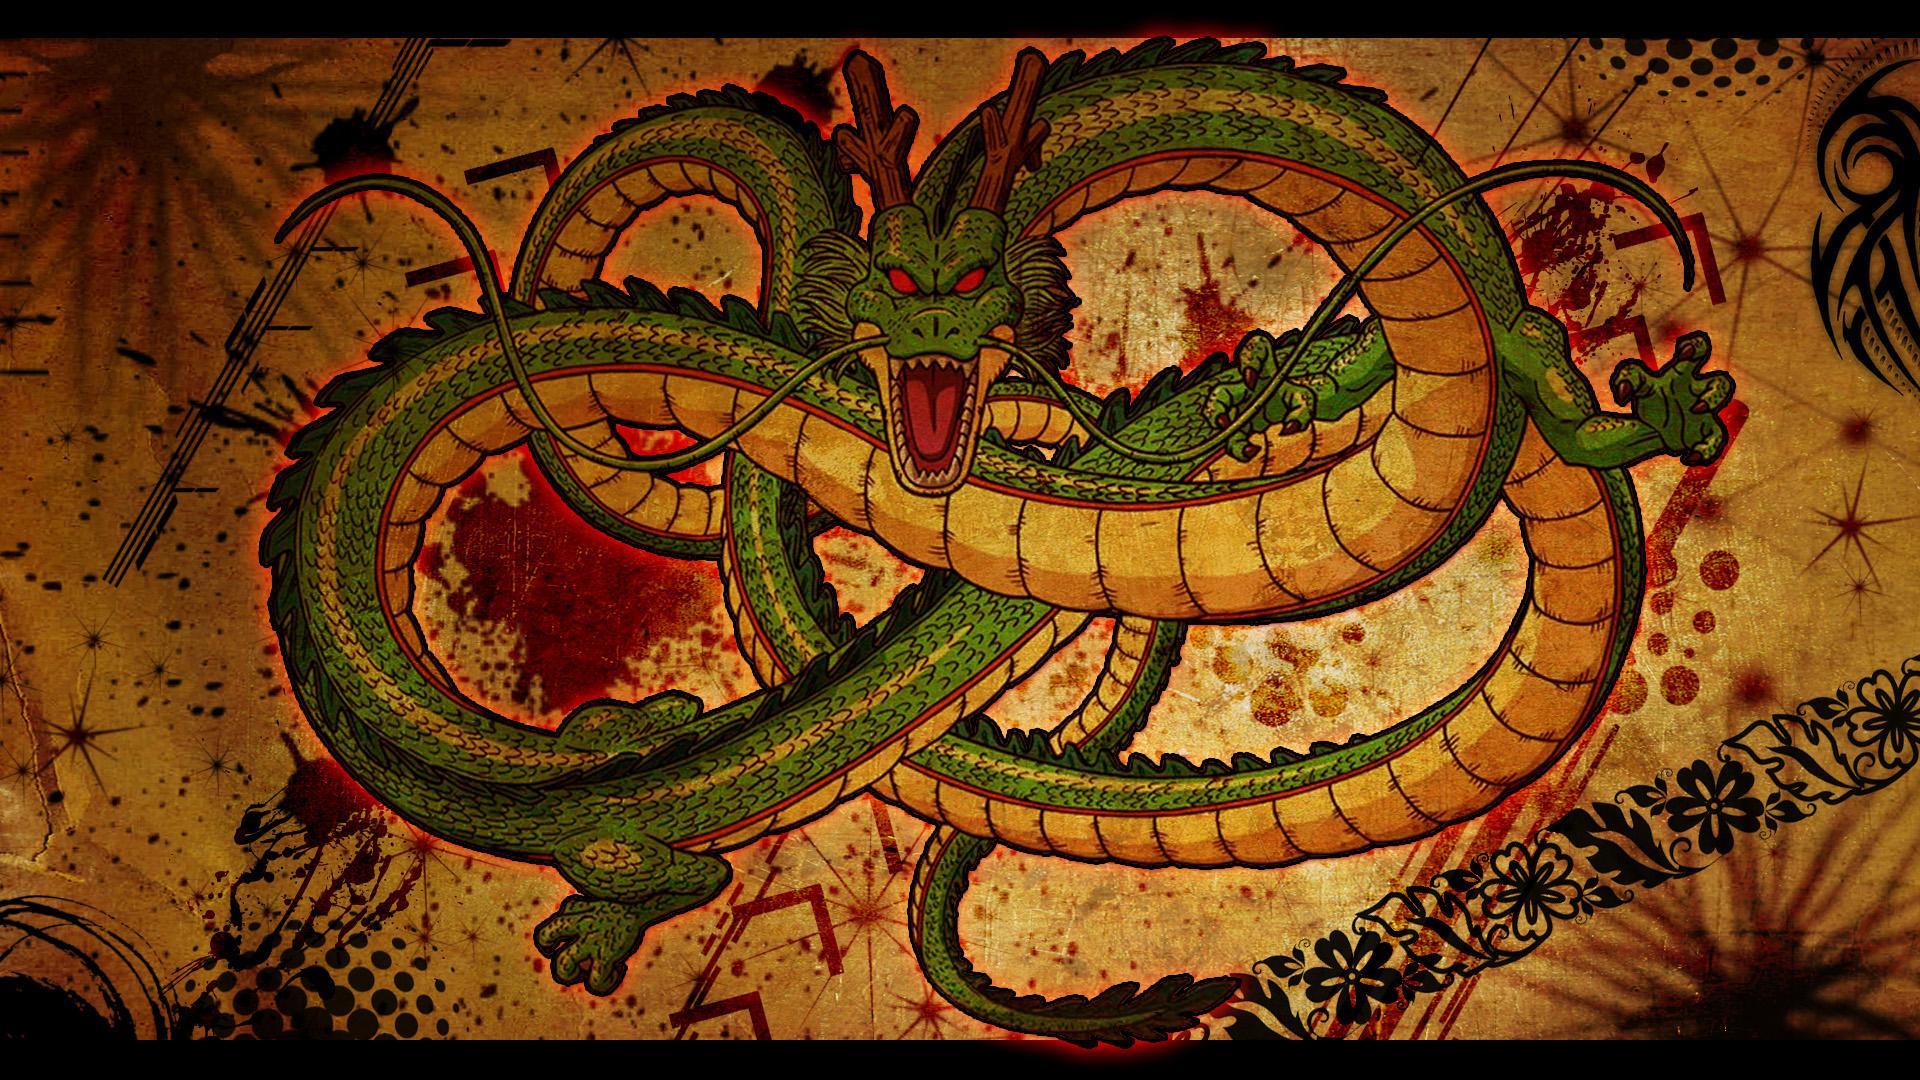 Download Dragon Ball Wallpaper 1920x1080 Full HD Wallpapers 1920x1080